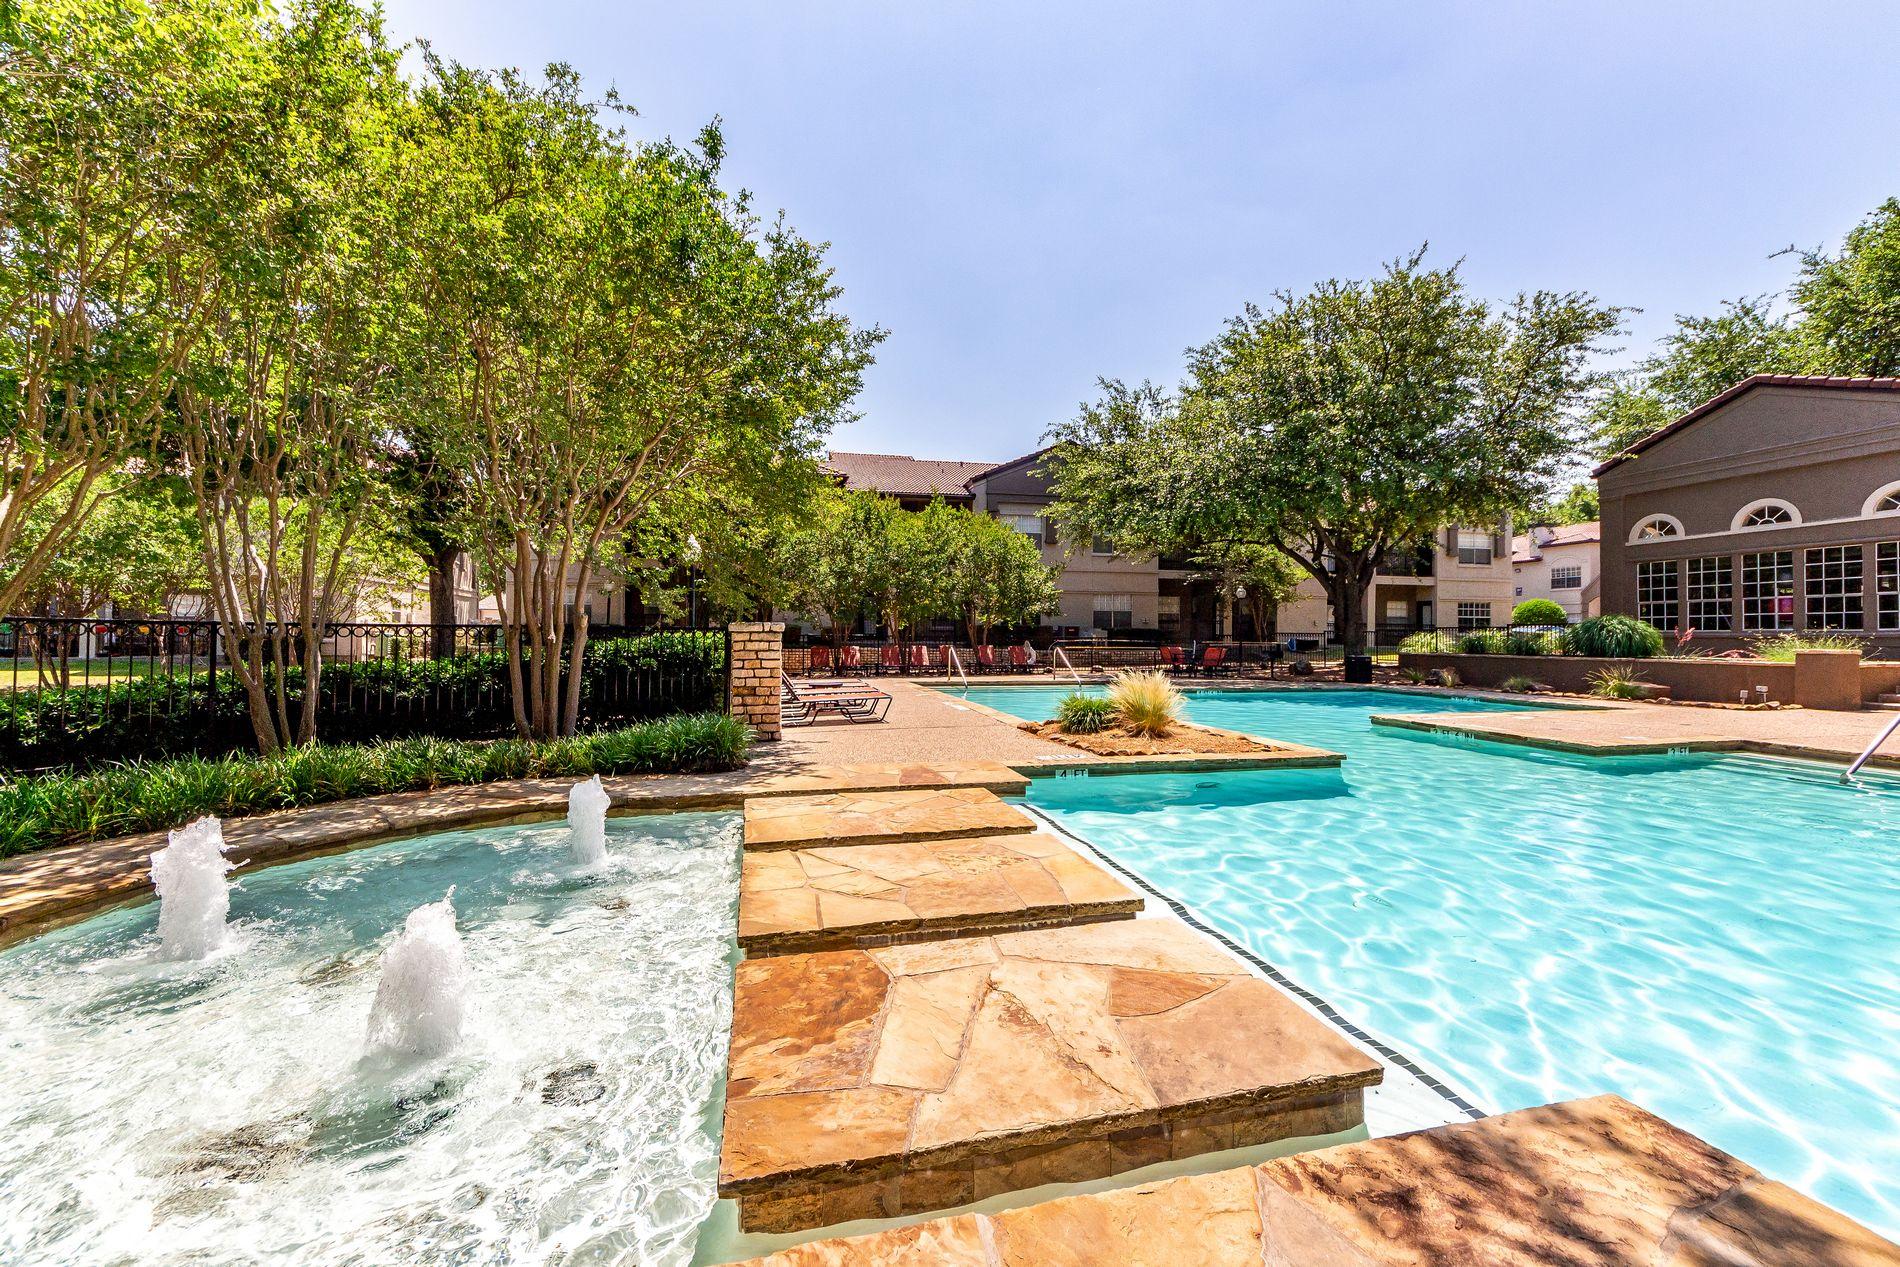 Second Pool Walkway at La Costa Apartments in Plano, Texas, TX